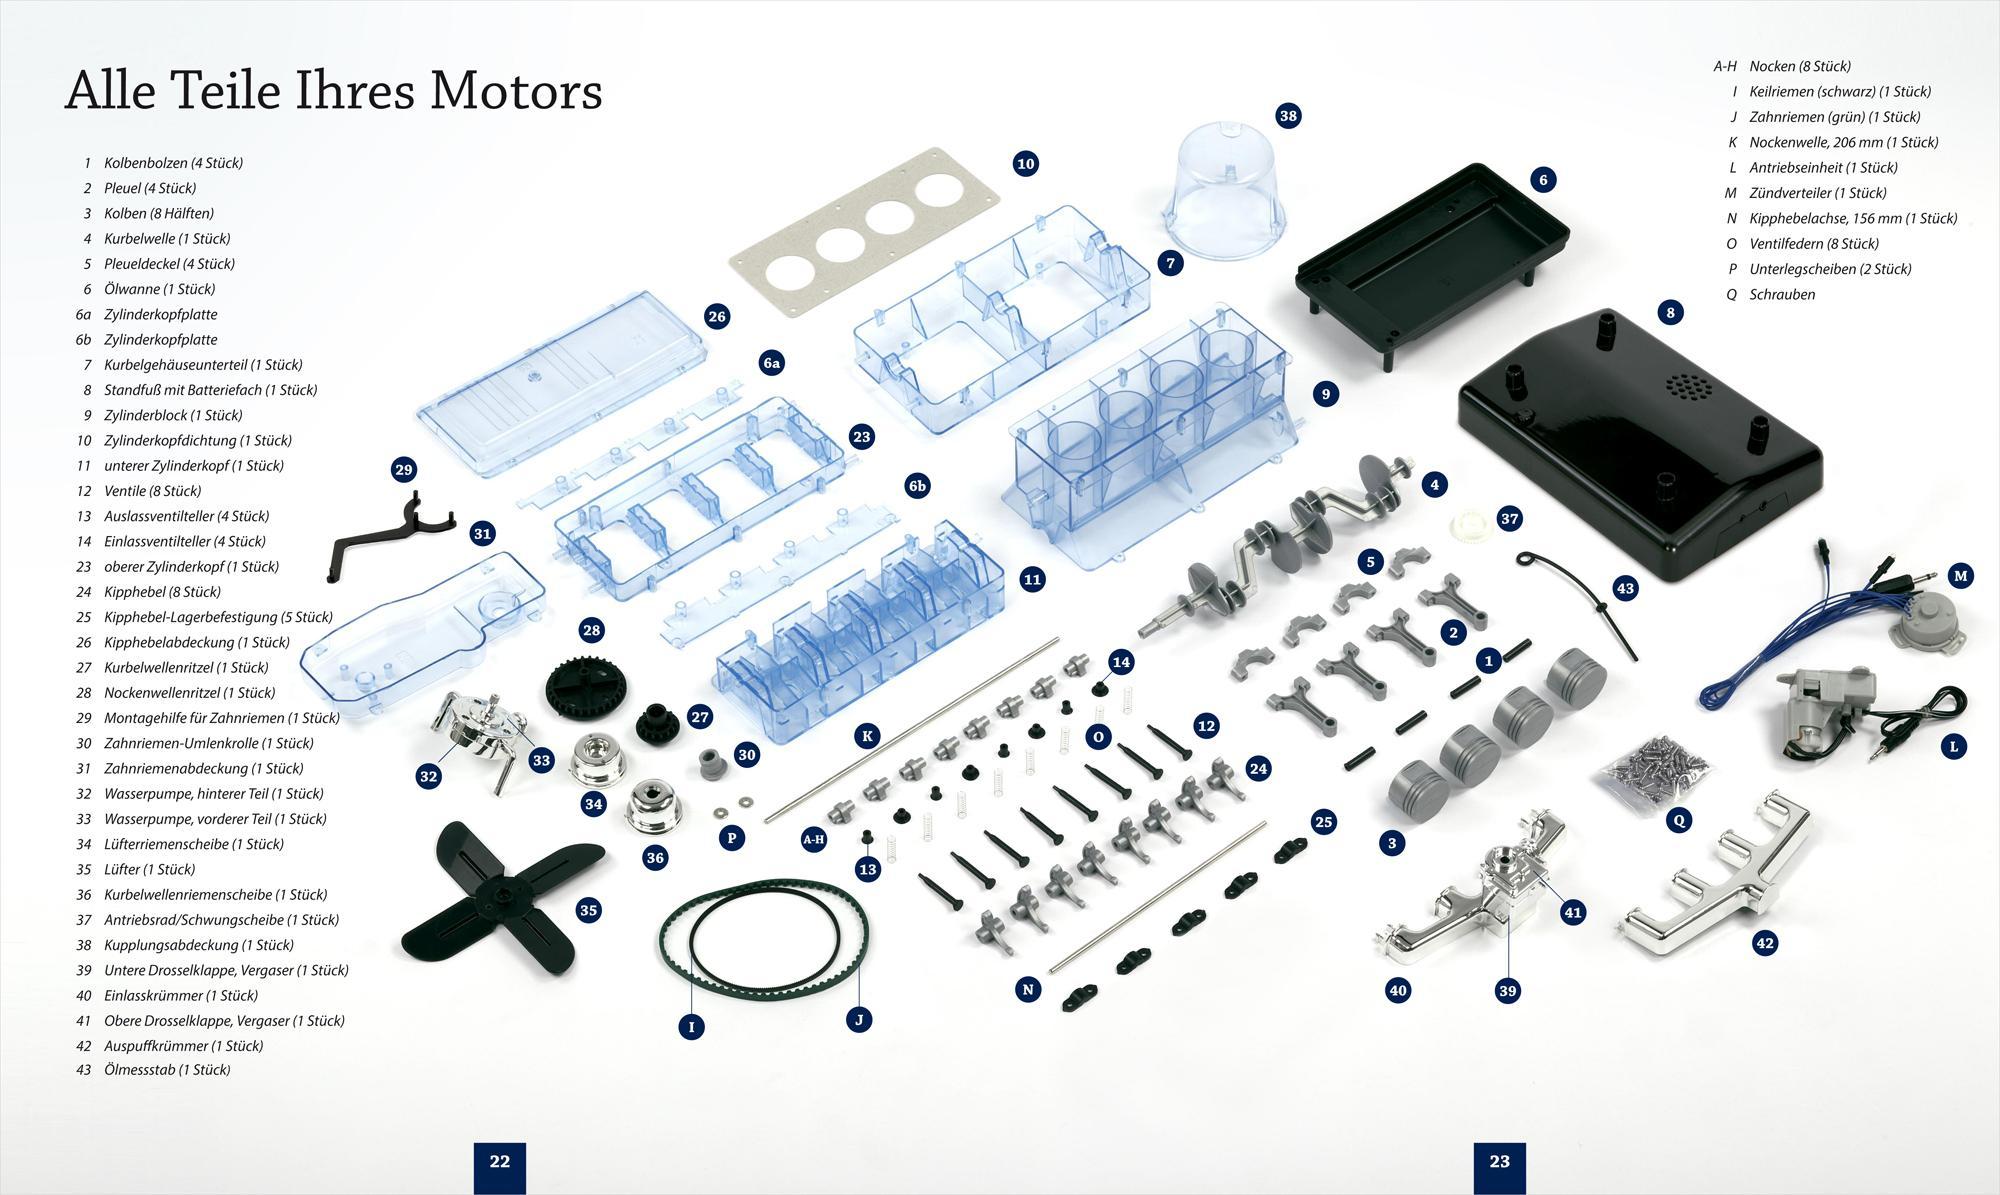 Gemütlich Teile Des Automotors Ideen - Schaltplan Serie Circuit ...